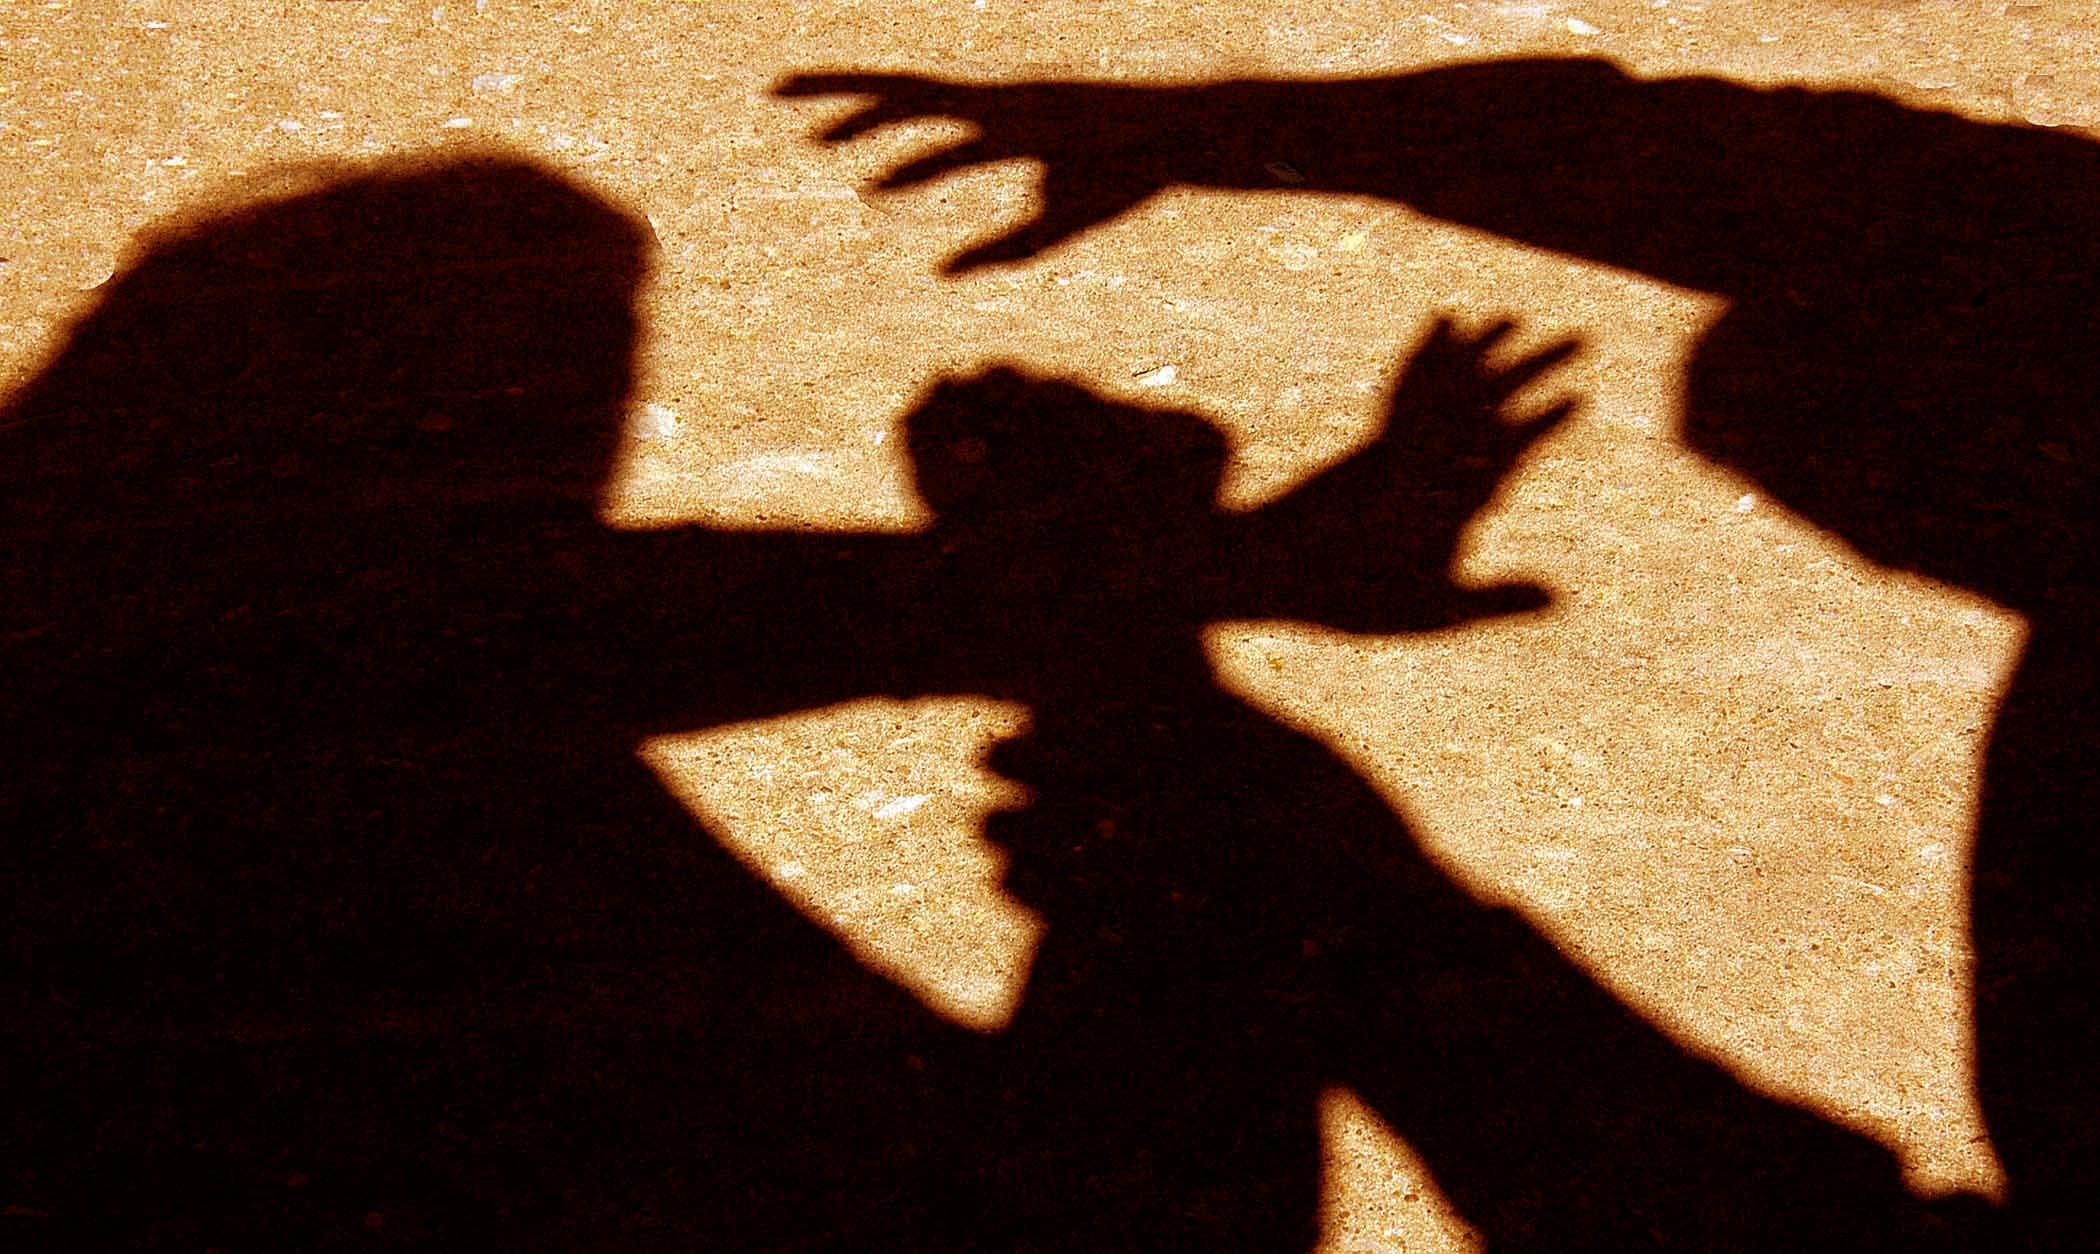 woman's pain » sexual assault